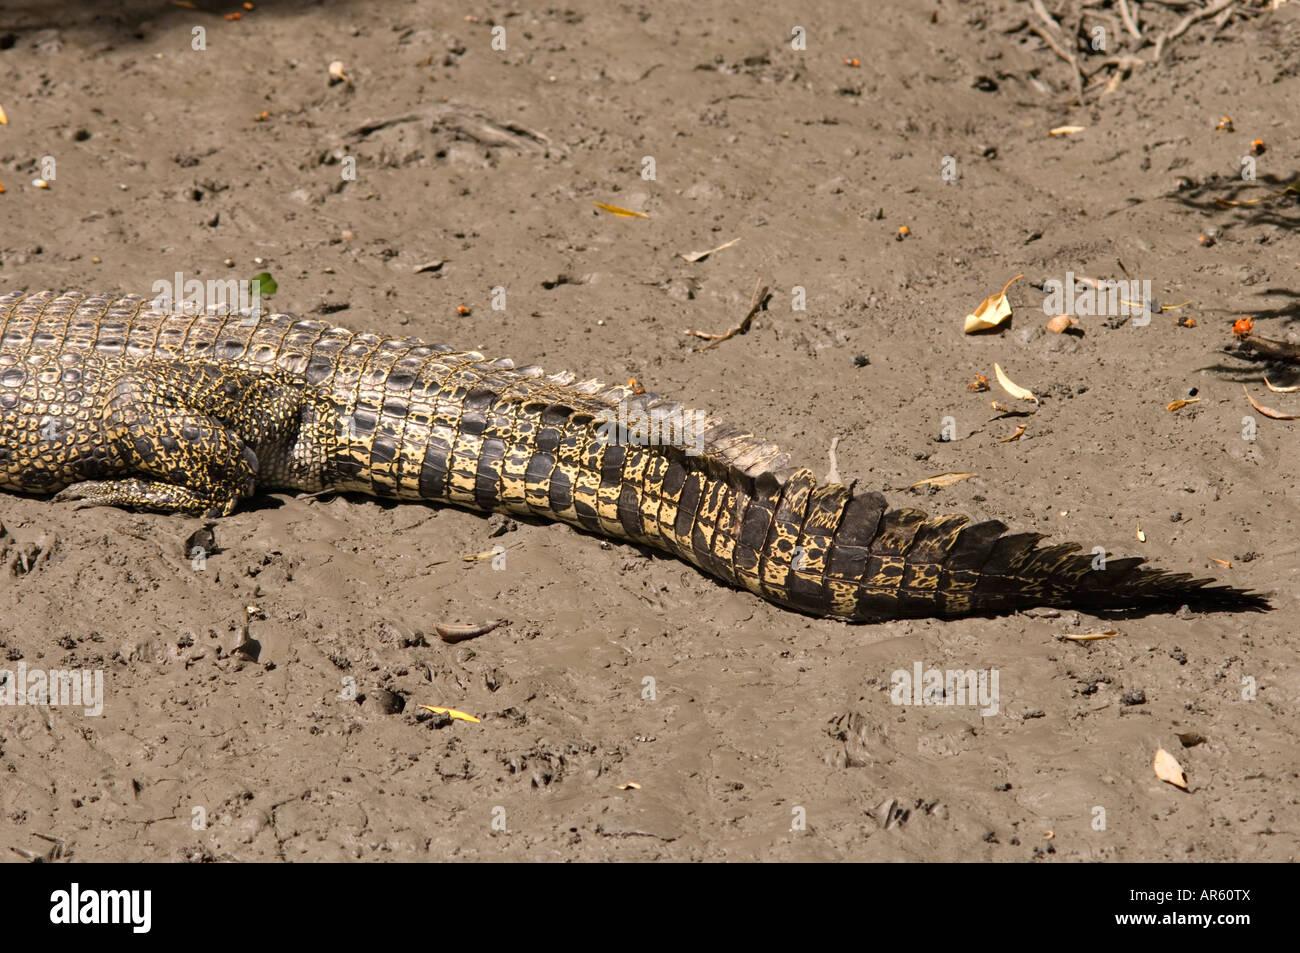 Tail of an Australian saltwater or estuarine crocodile - Stock Image